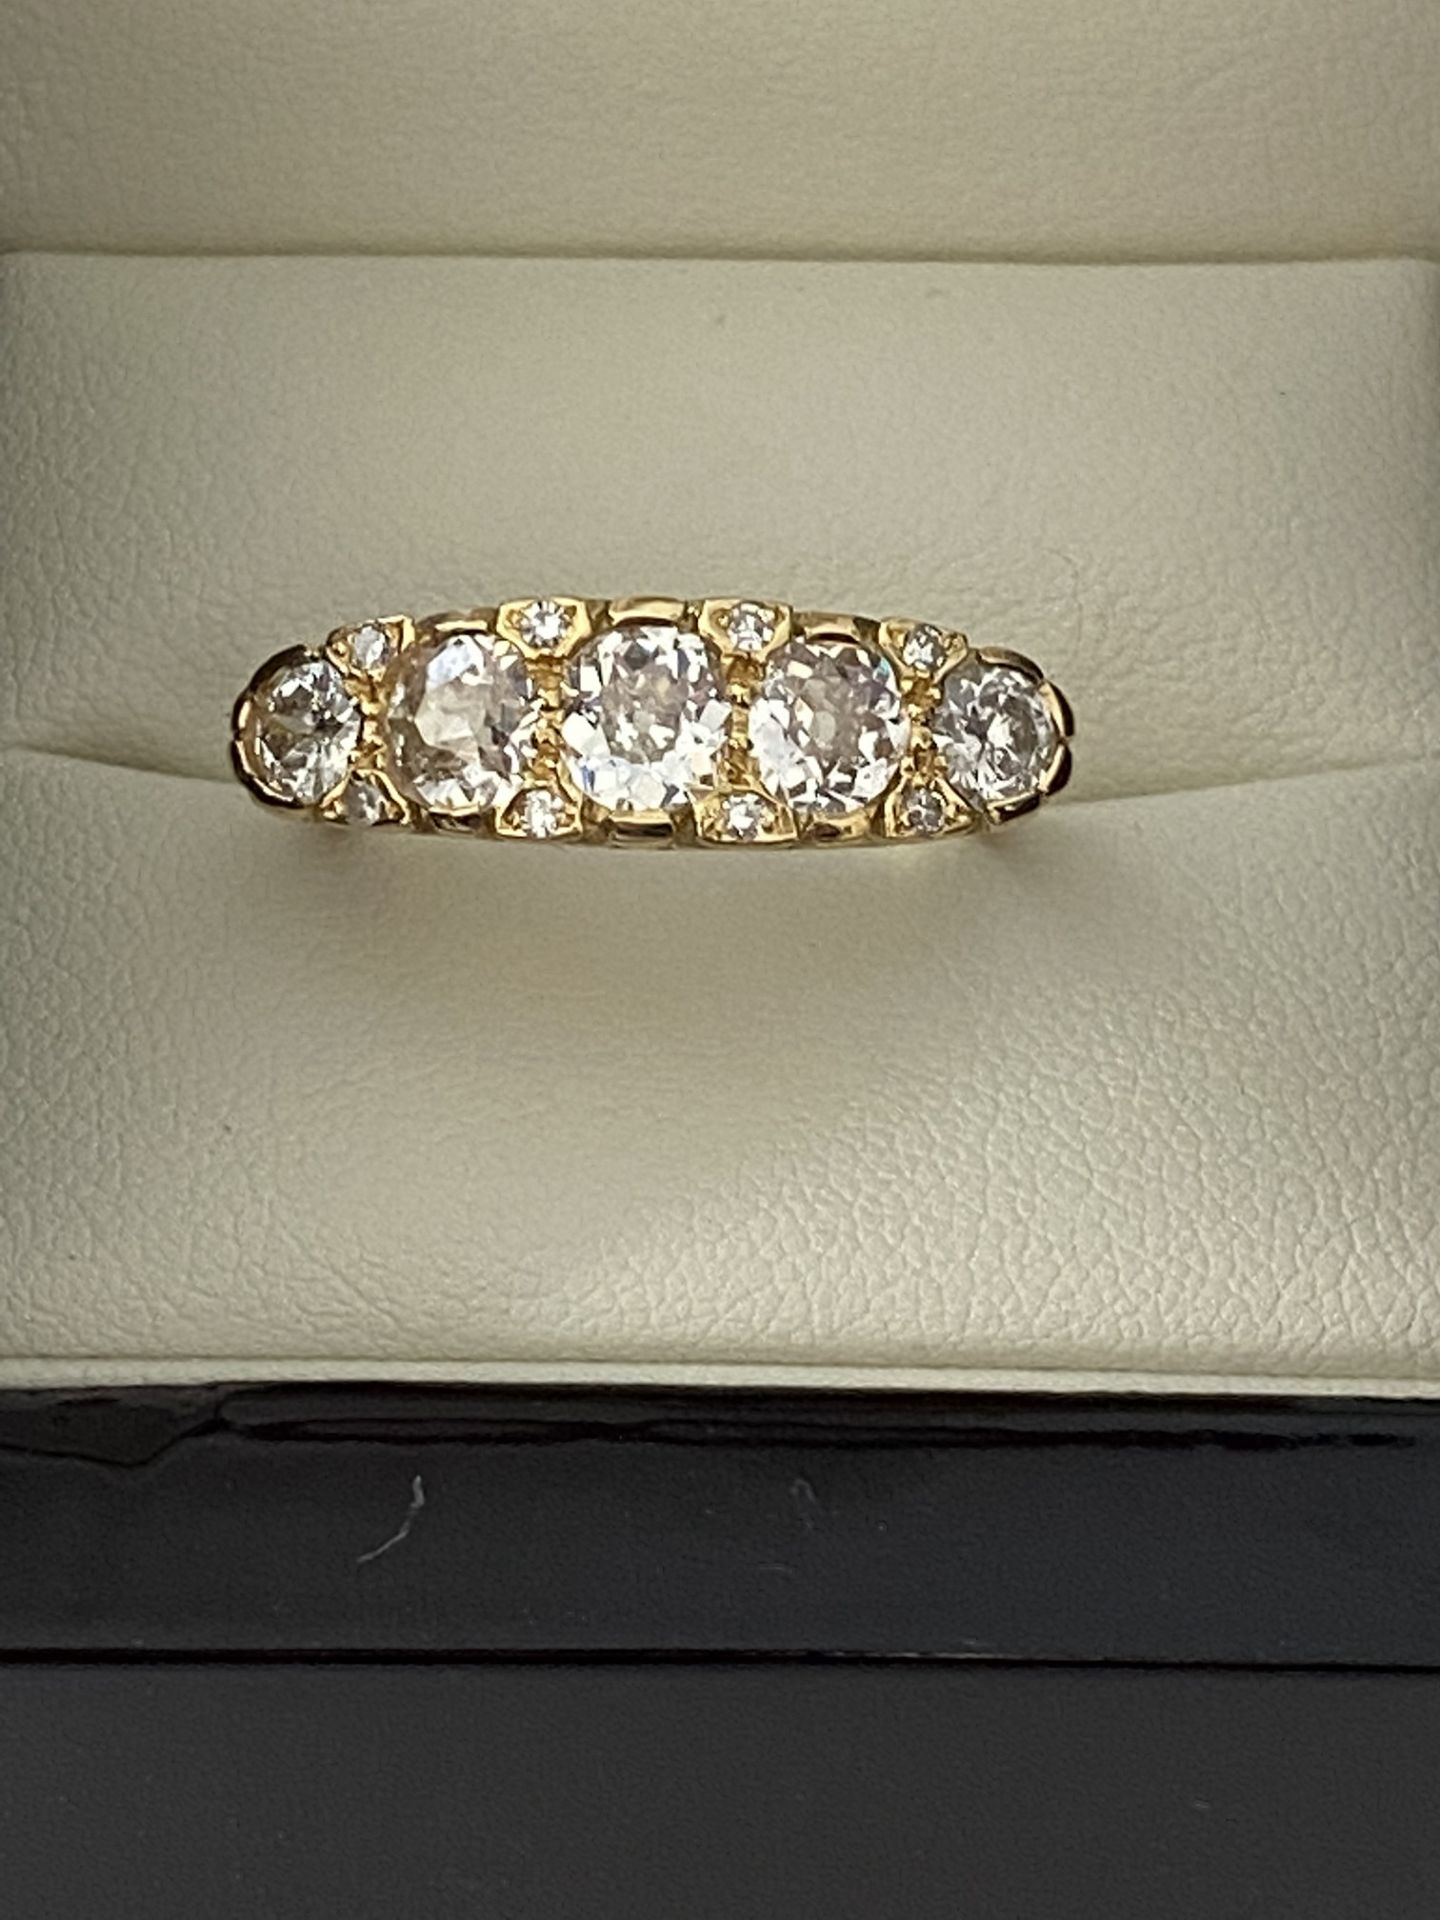 FINE 18ct YELLOW GOLD 2.00ct 5 STONE DIAMOND RING - Image 7 of 15